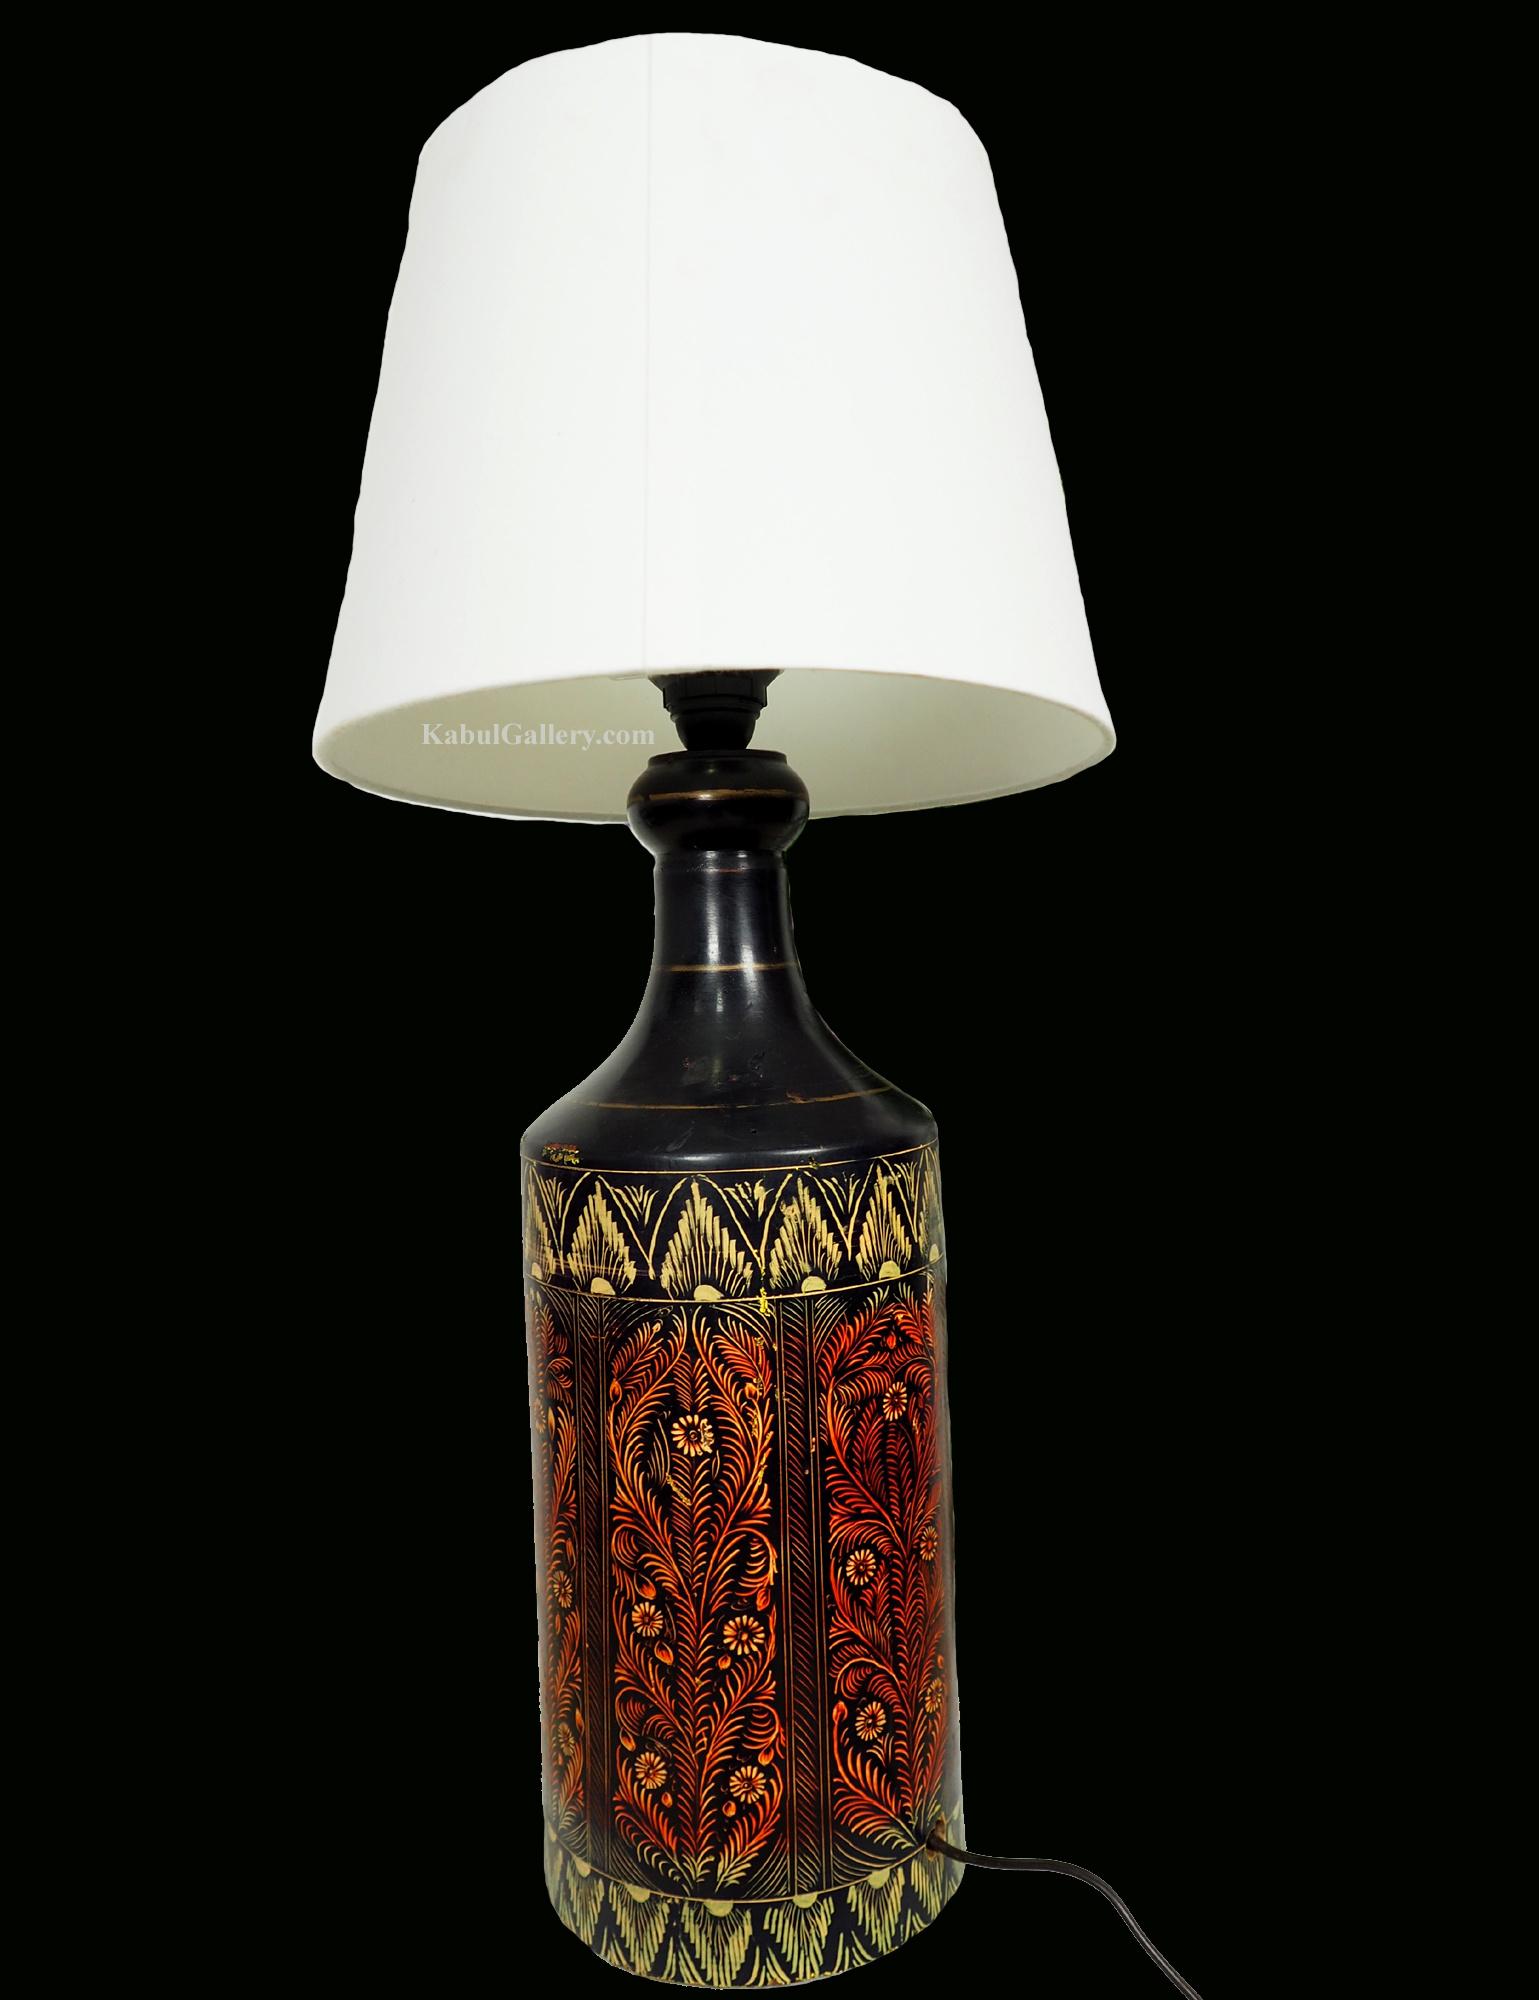 rient handgearbeitete Lacquerware Massiv Holz Flasche Lampe Lampenfuß Lampensockel aus Afghanistan Pakistan